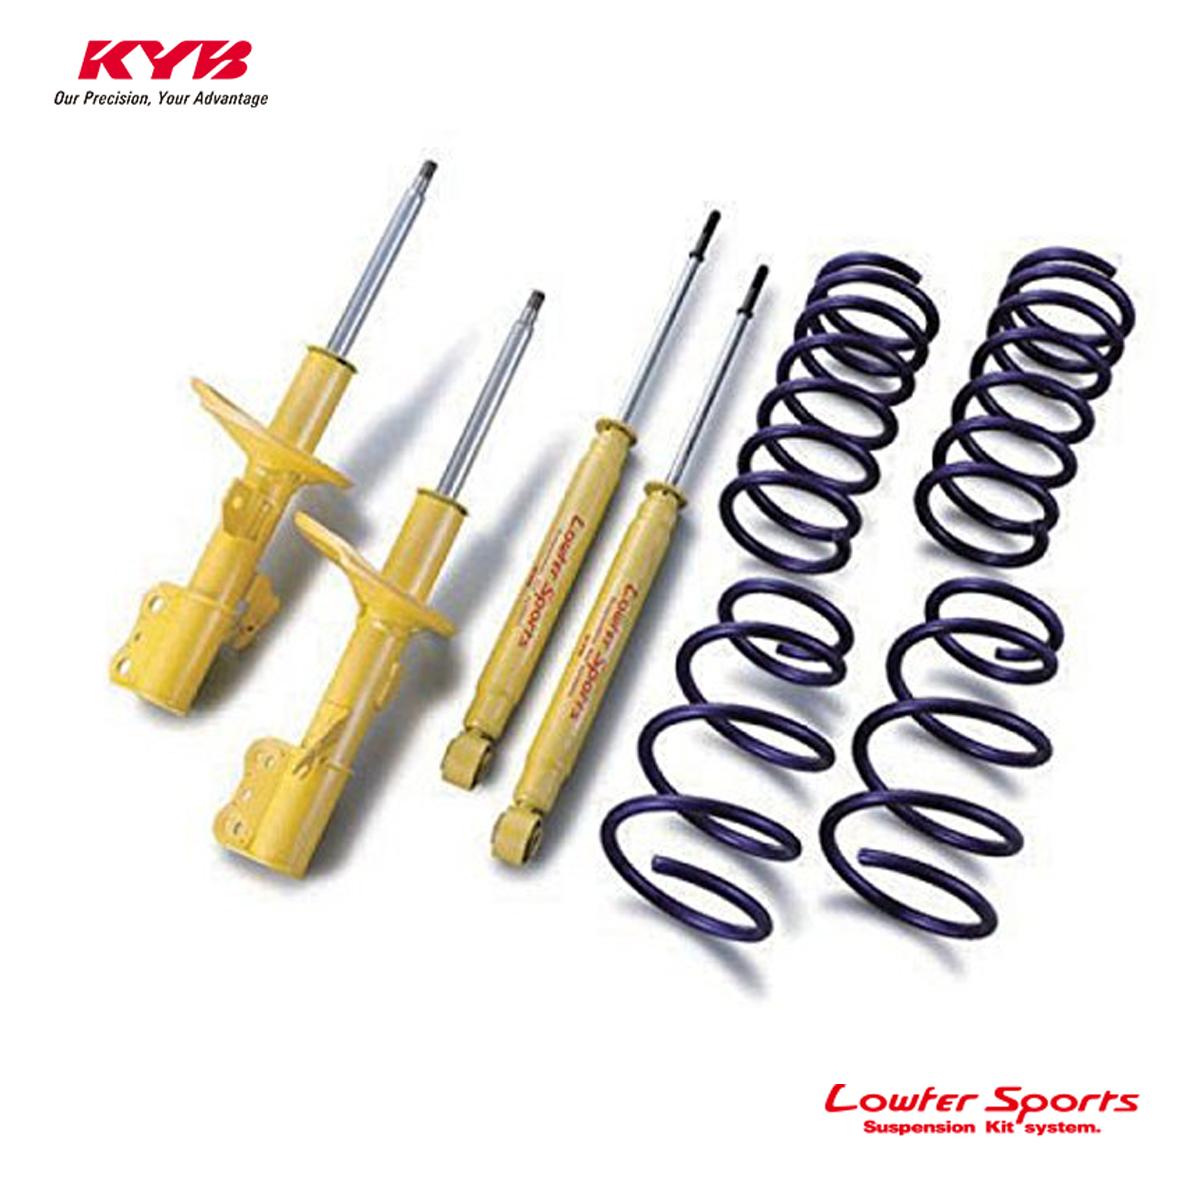 KYB カヤバ CX-5 KEEFW ショックアブソーバー サスペンションキット Lowfer Sports LKIT-KEEFW8 配送先条件有り